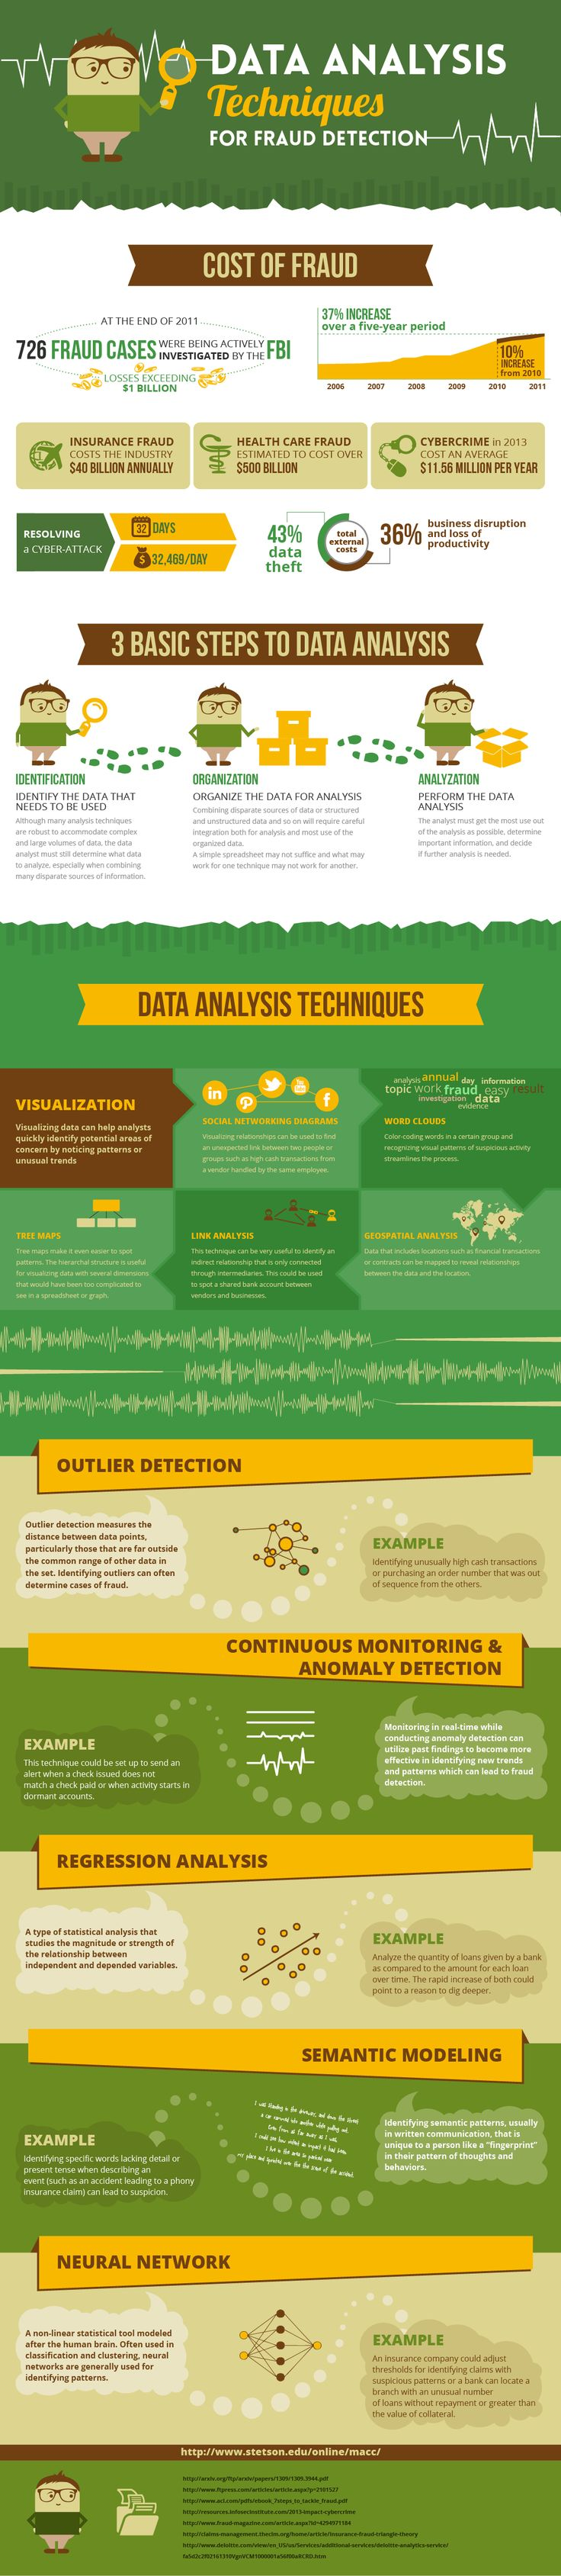 How to Detect Fraud Using Data Analysis (Infographic) | Inc.com